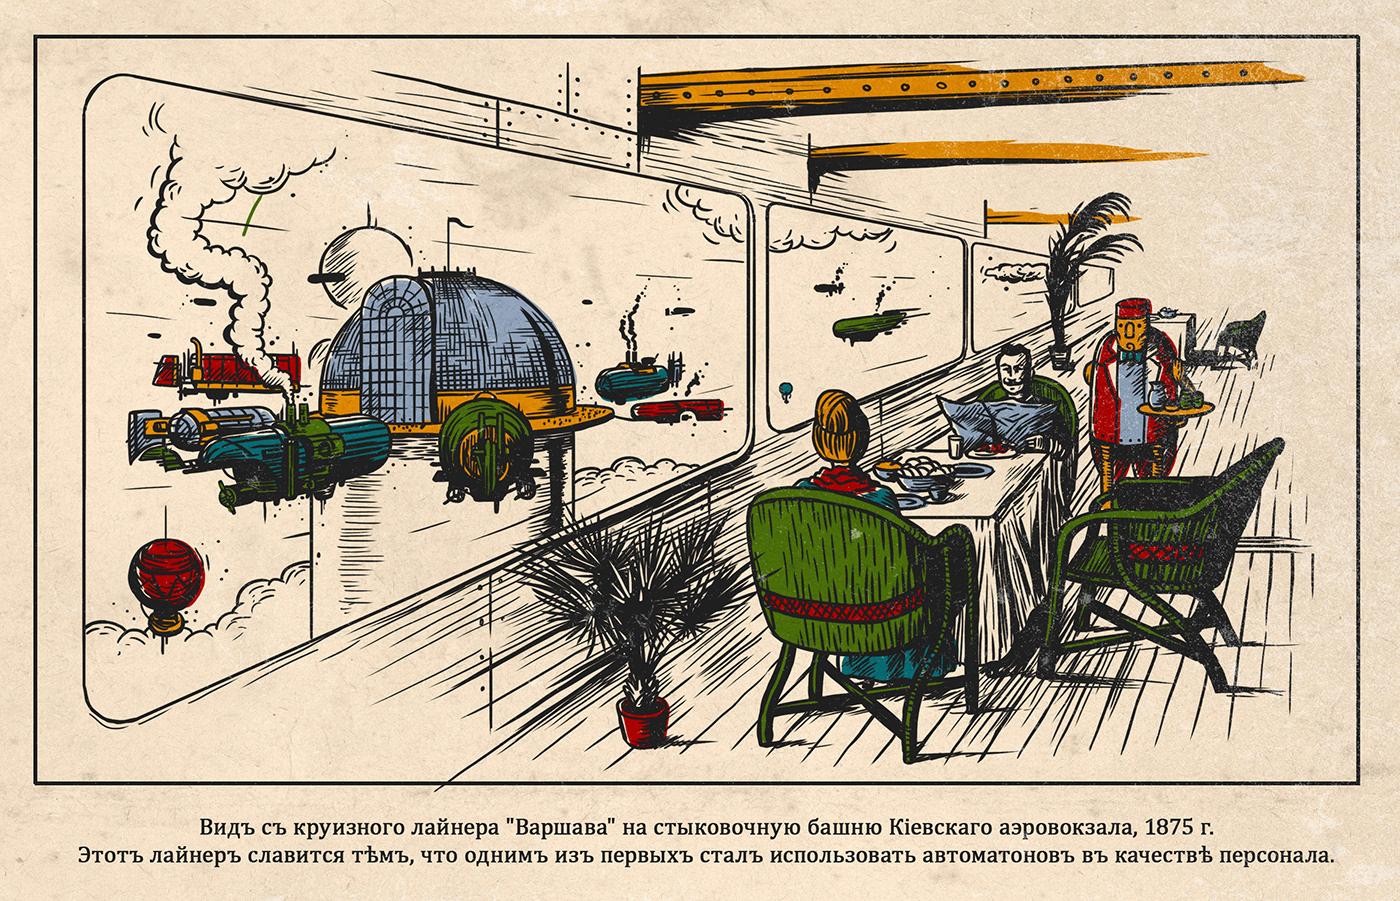 Image may contain: cartoon, illustration and drawing